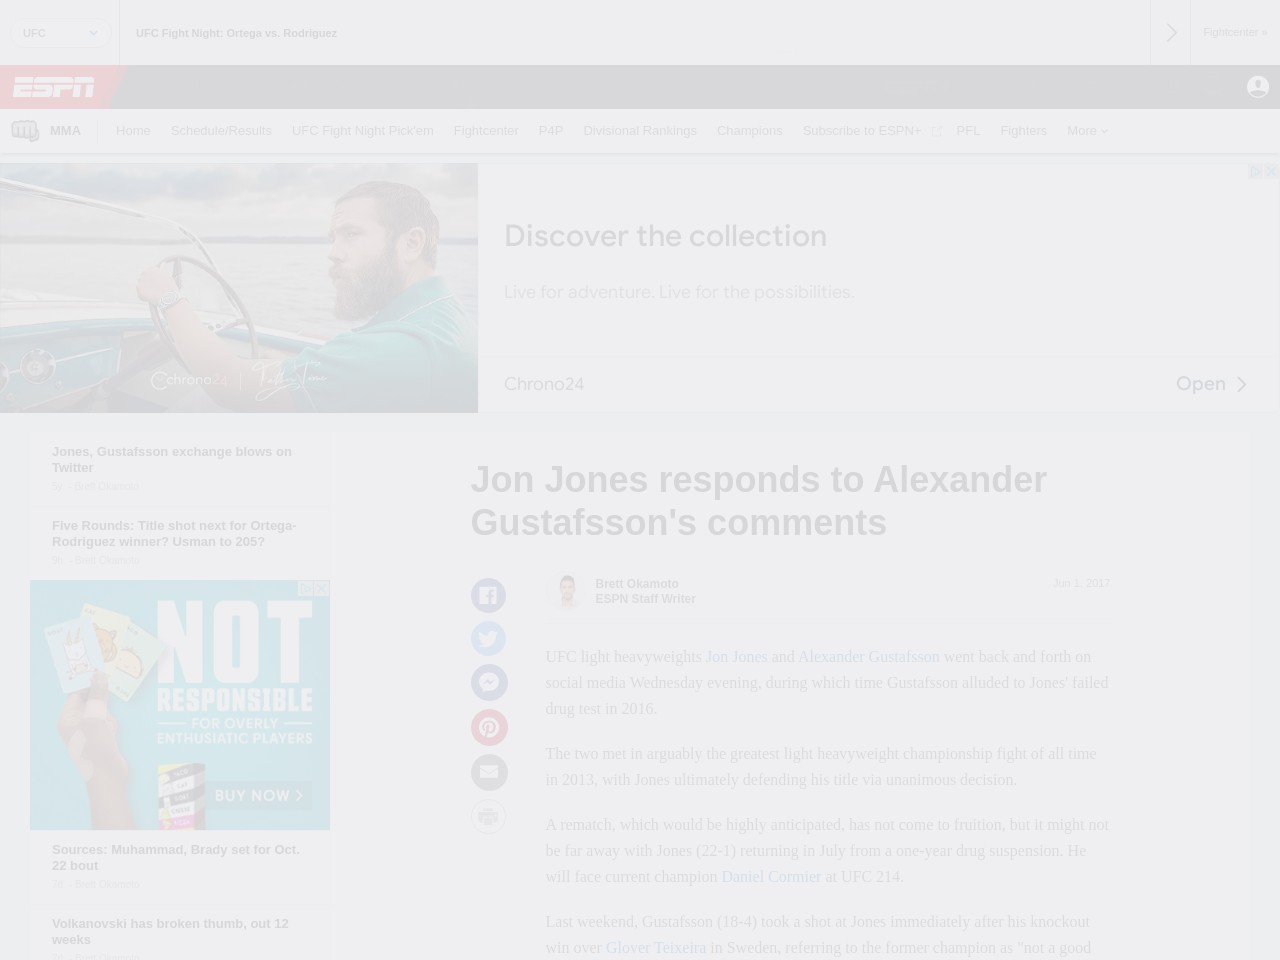 Jones, Gustafsson exchange blows on Twitter